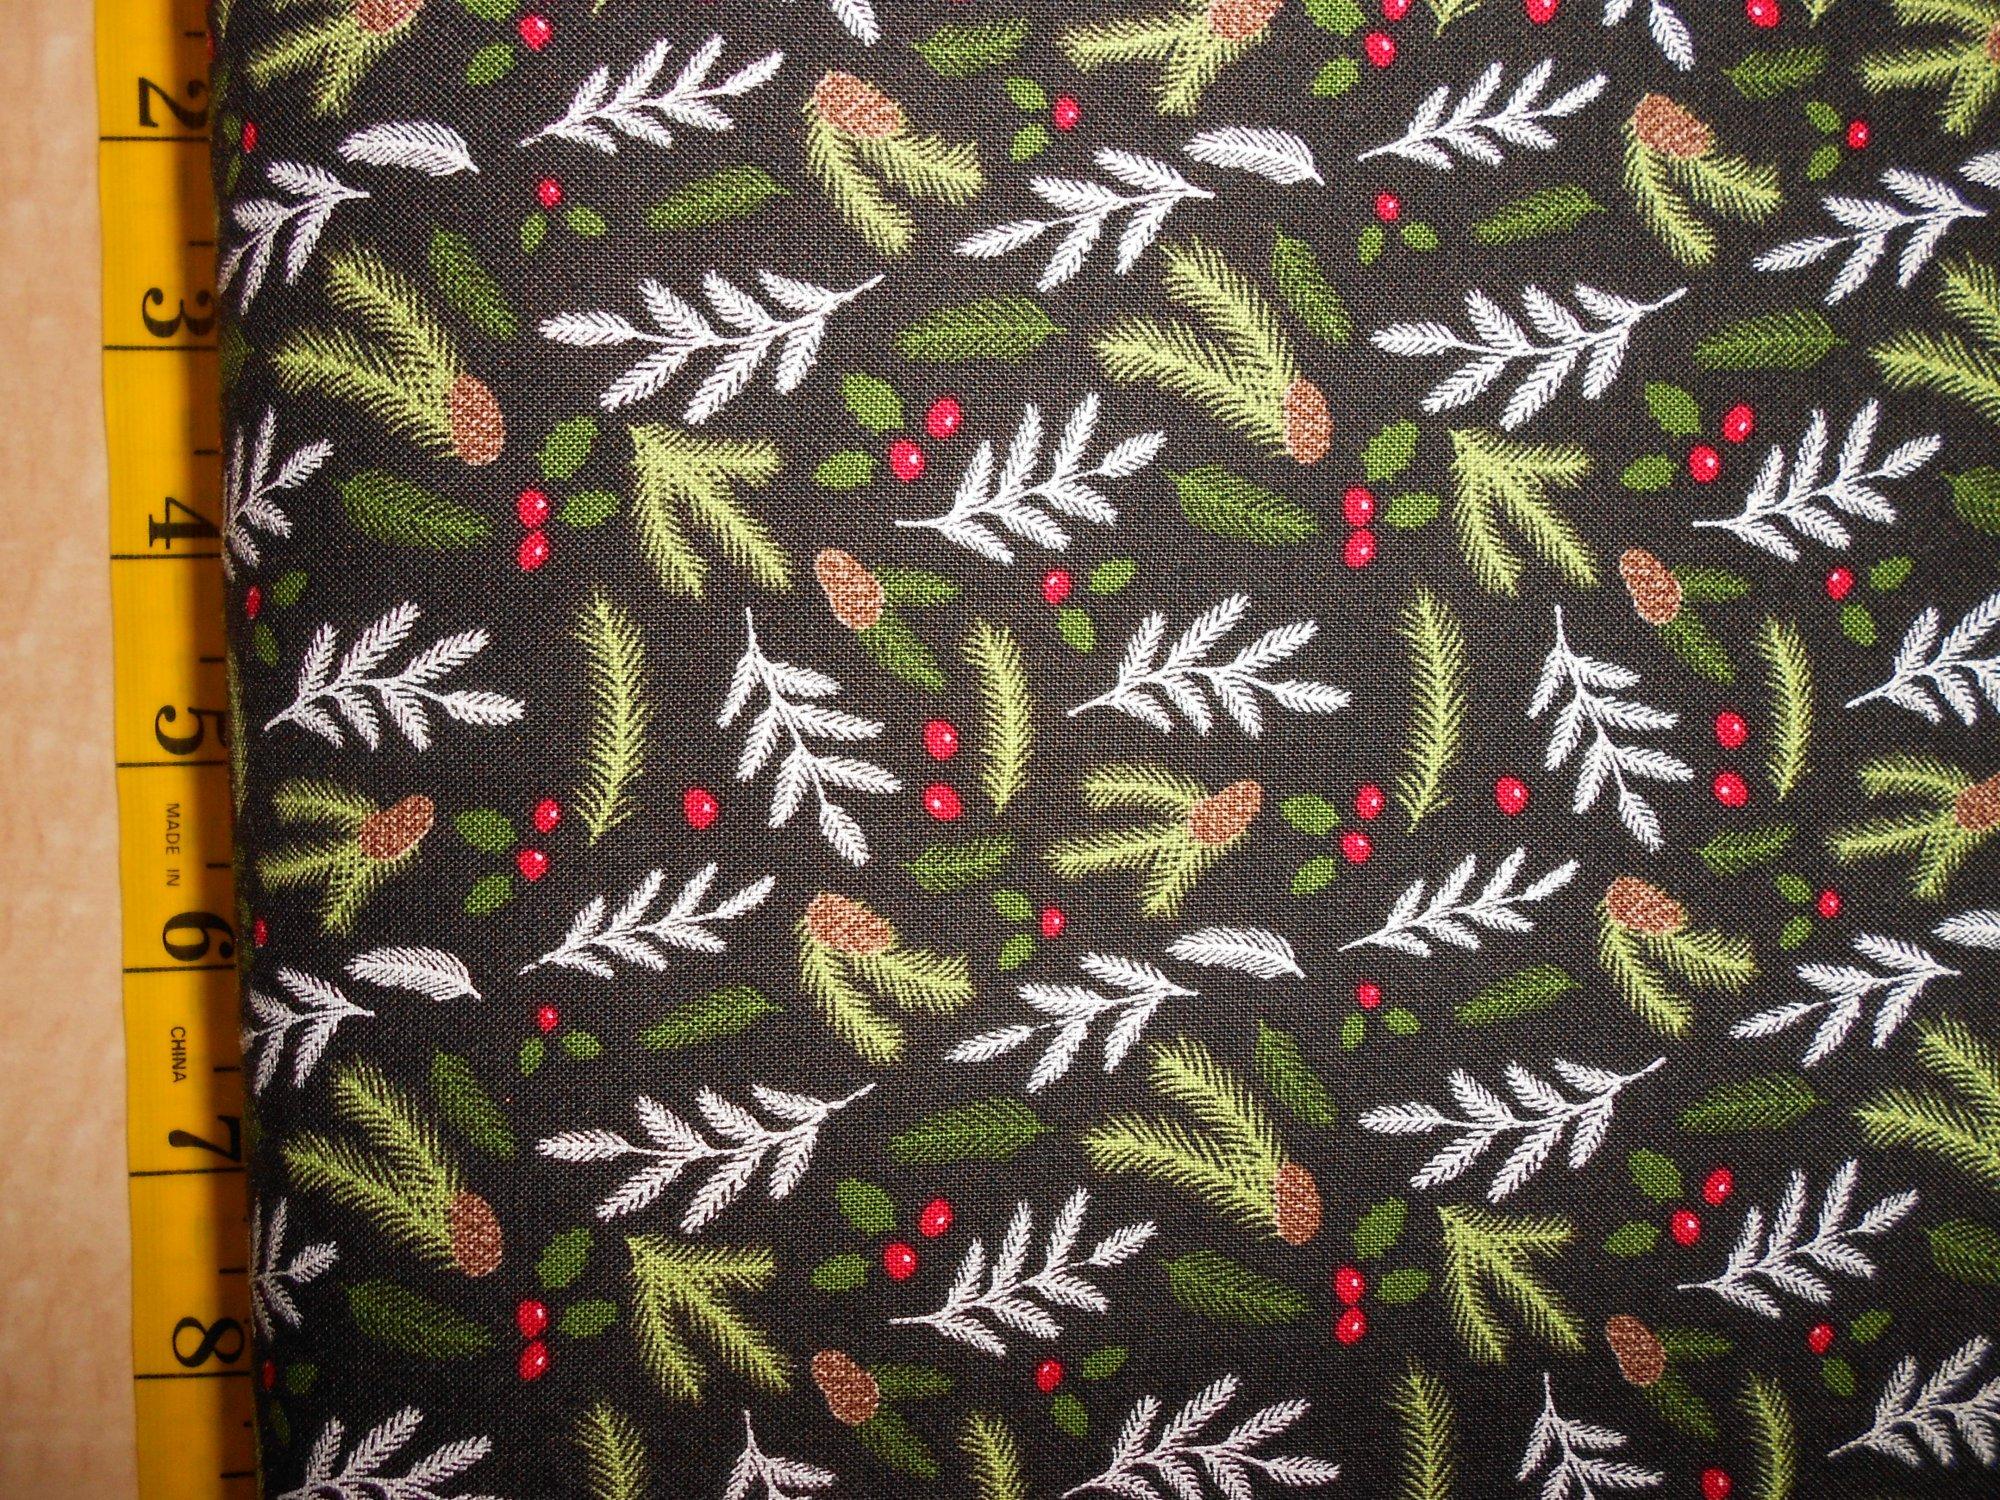 Evergreen sprigs & holly on black - Comfort & Joy